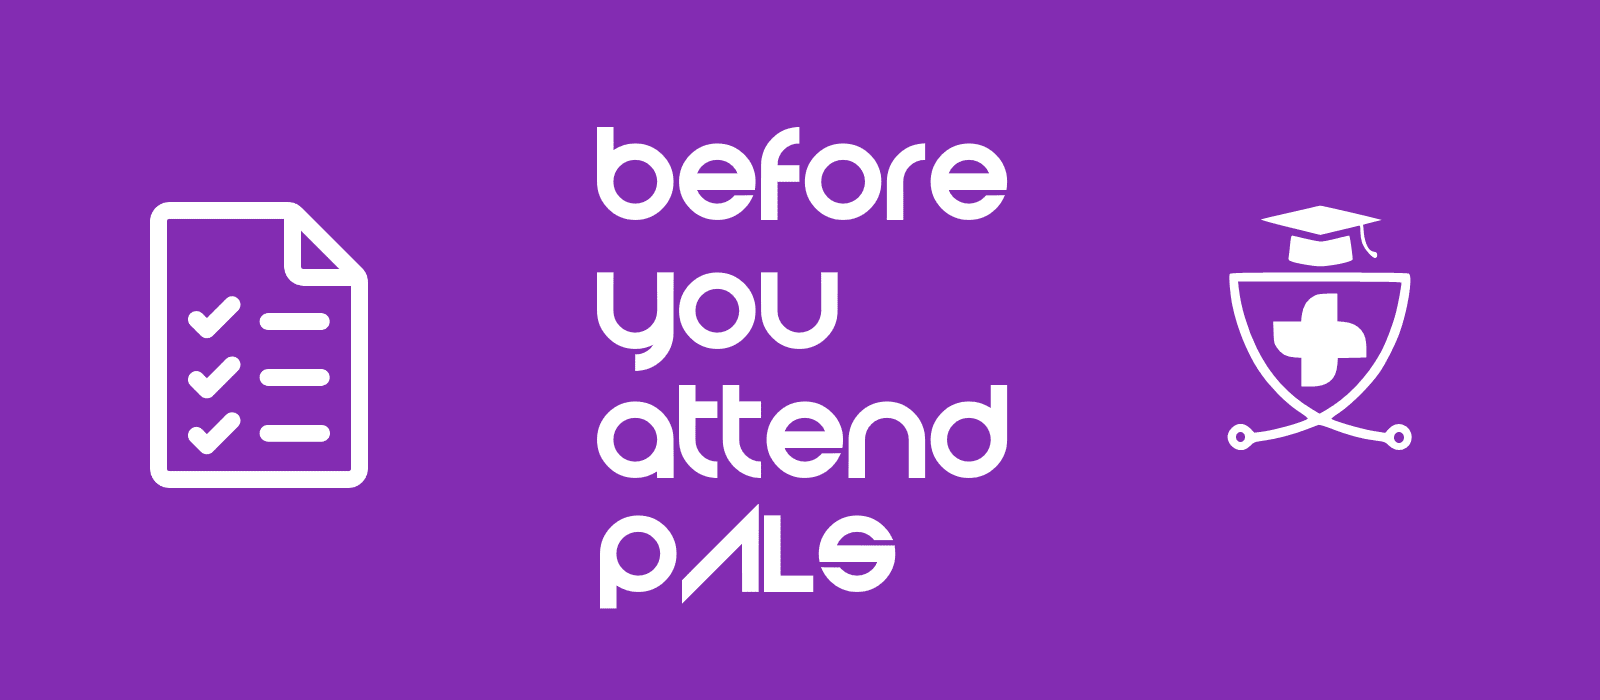 Before attending PALS